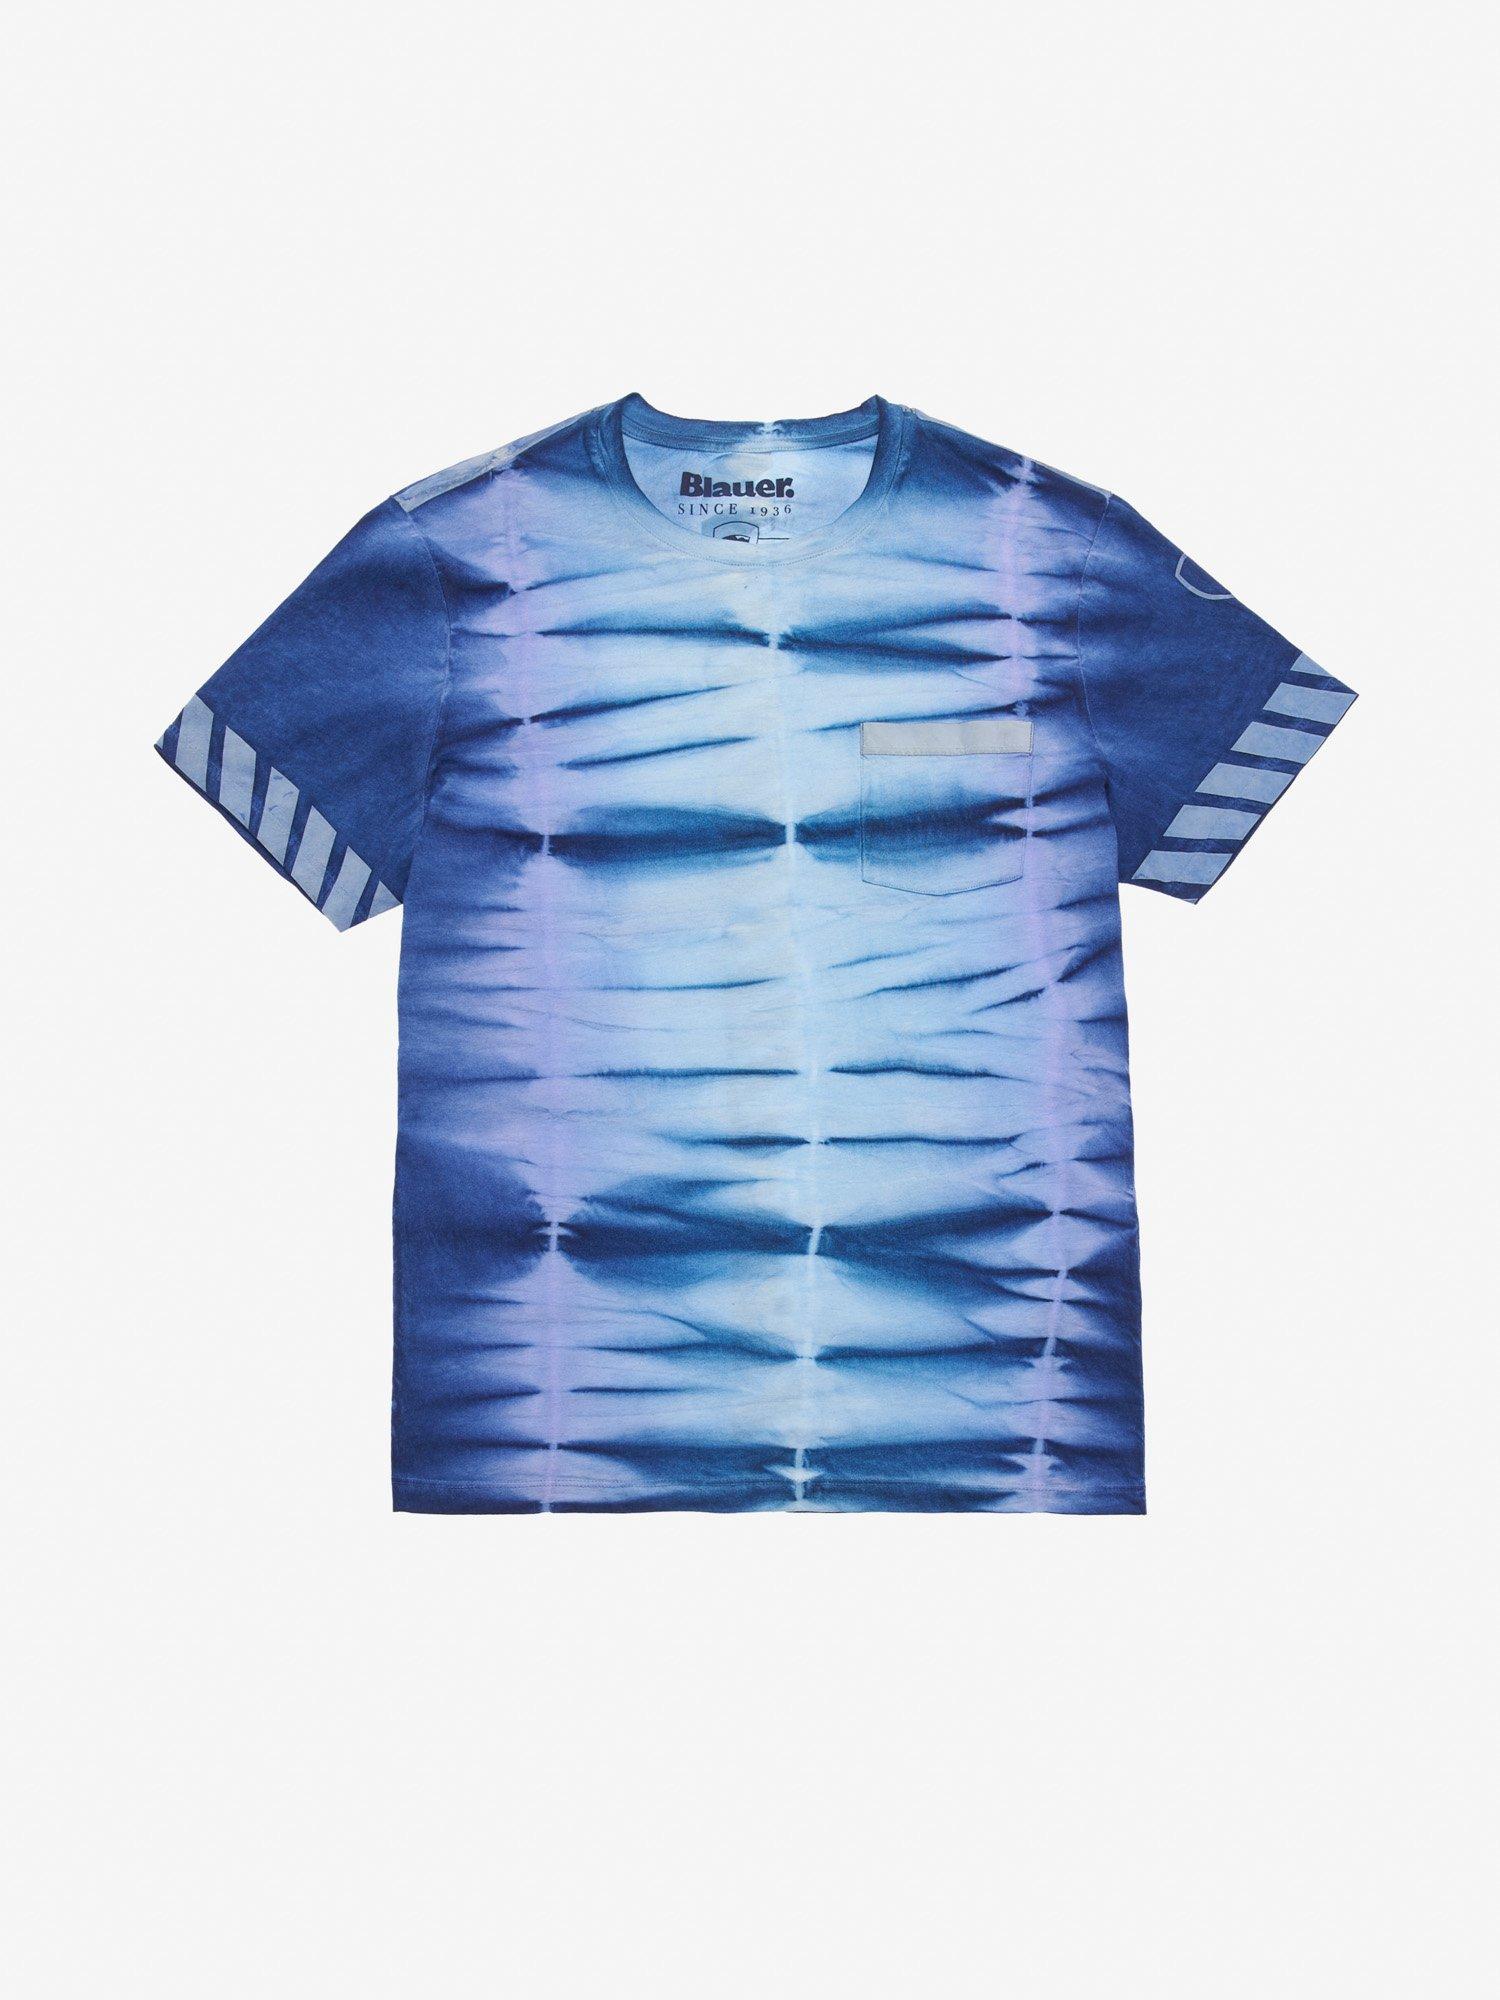 Blauer - MEN'S REFLECTIVE TIE DYE T-SHIRT - Ultramarine Blue - Blauer